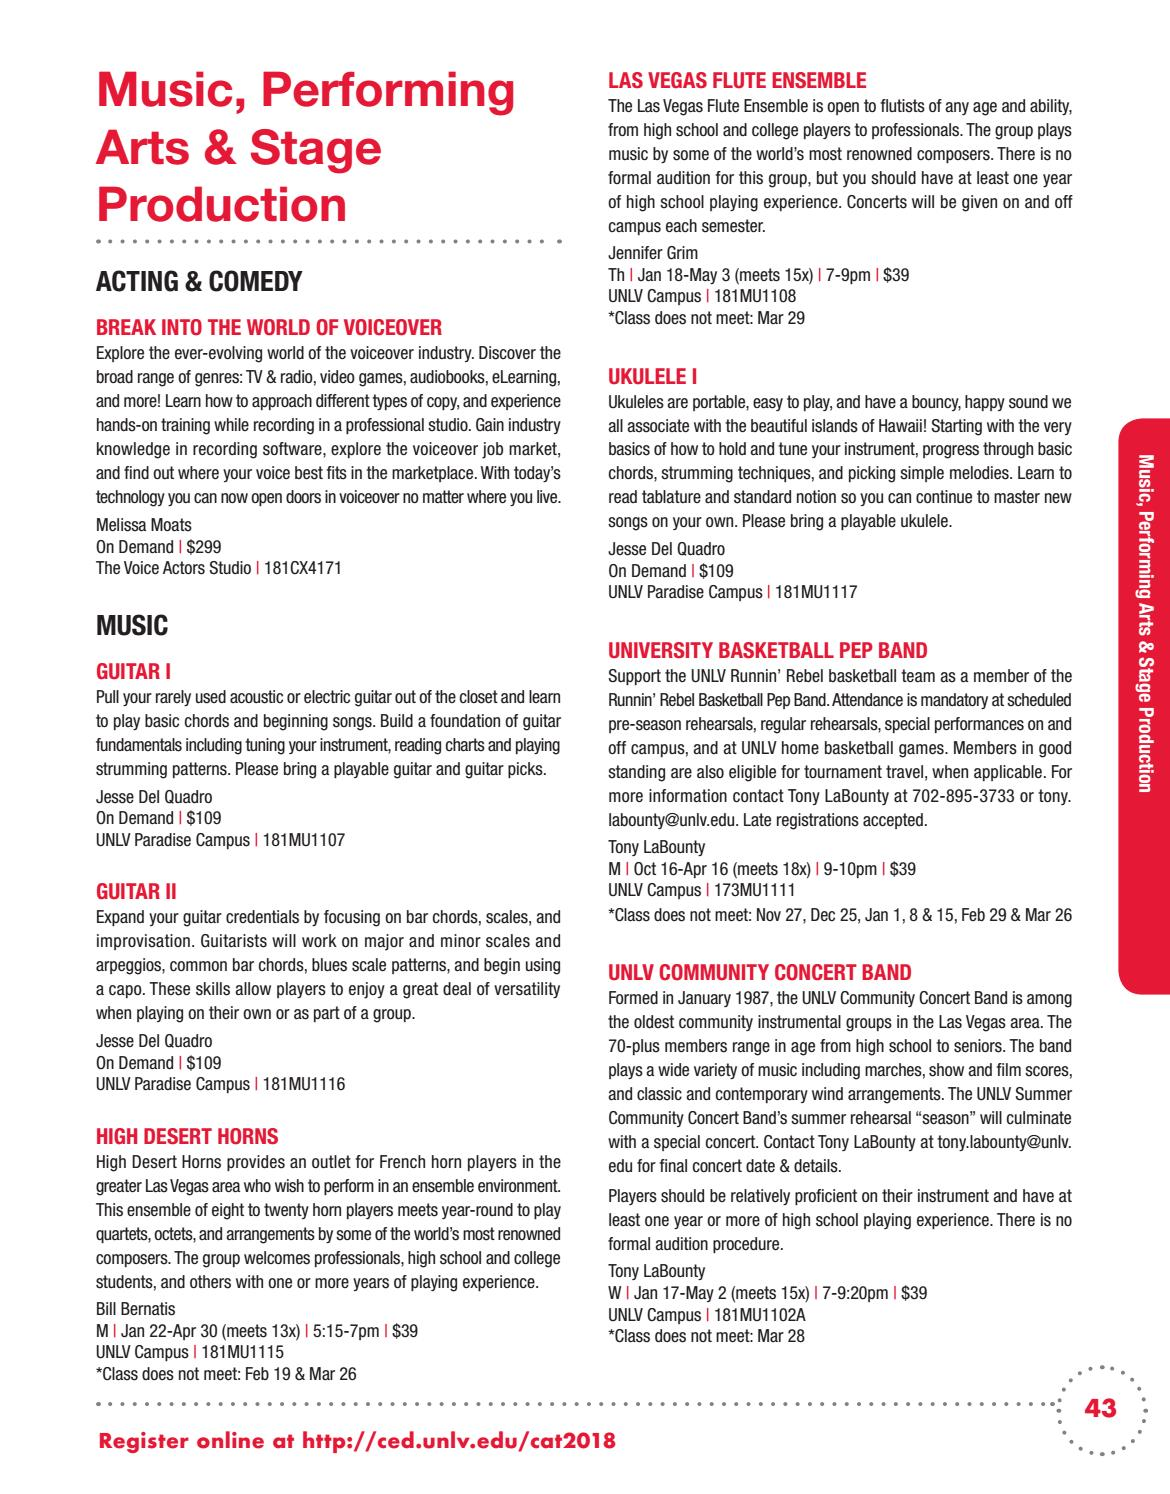 UNLV Spring 2018 Continuing Education Catalog by UNLV